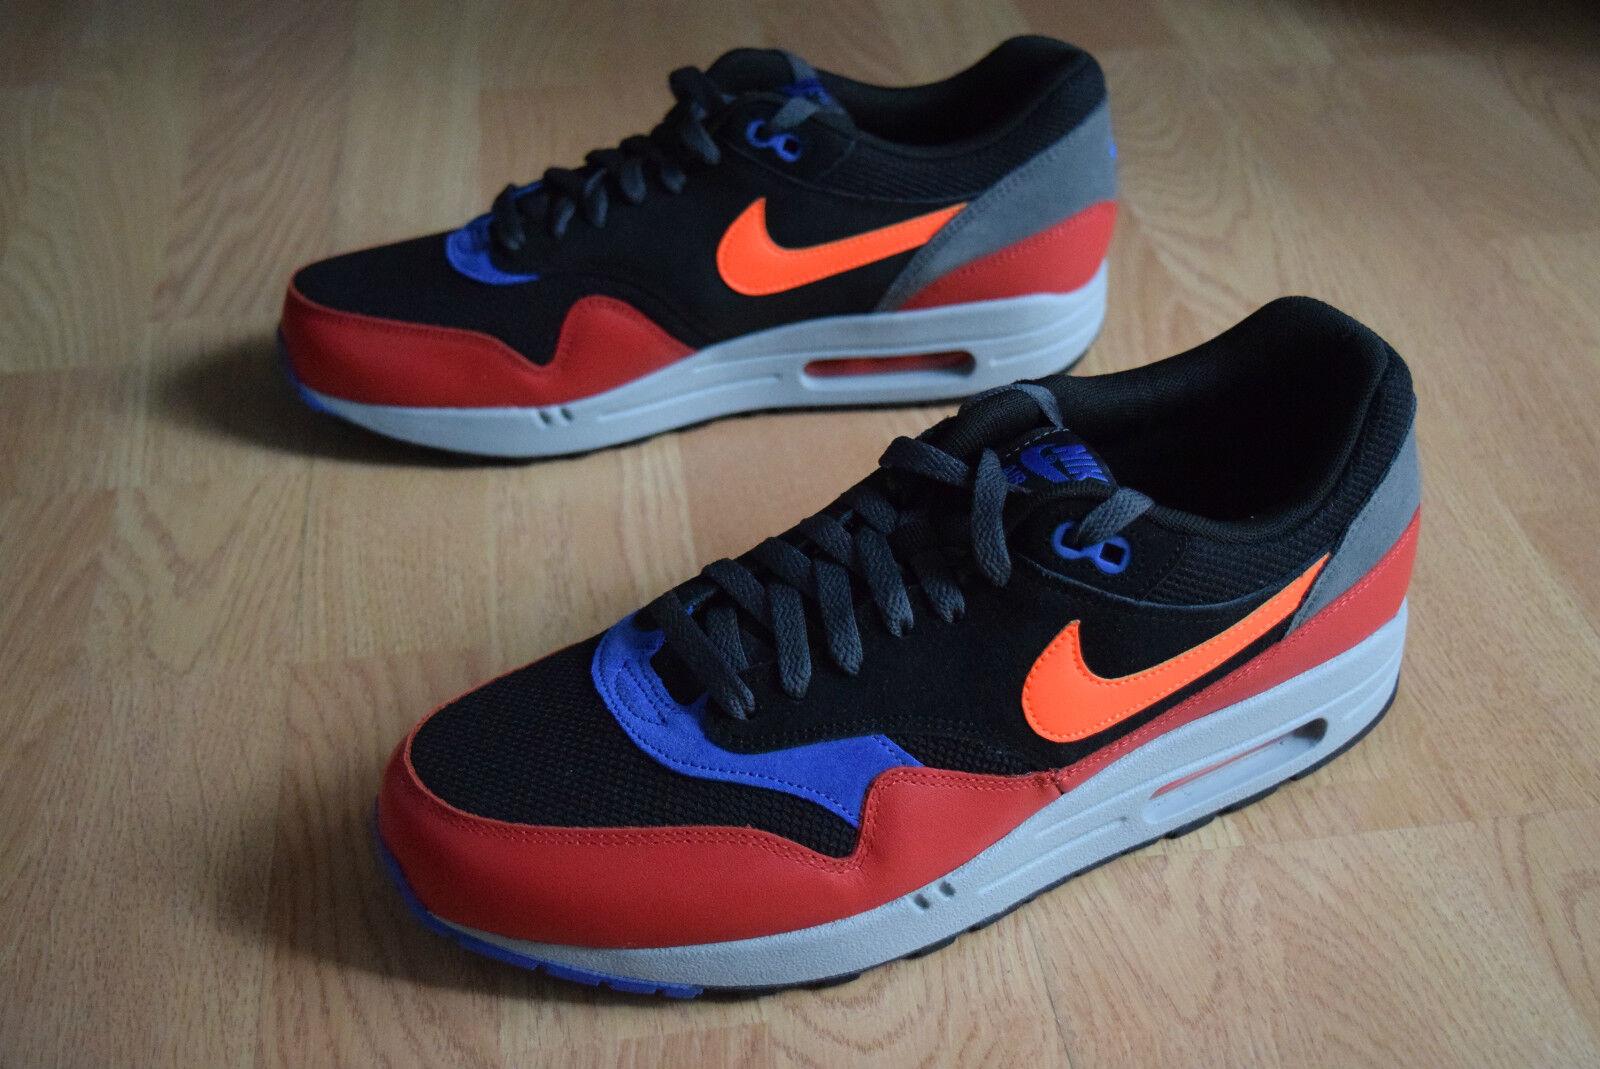 Nike Air Max 1 Essentielles 42 42,5 43 44 45 46 Classic 90 Bw Tavas 537383 024